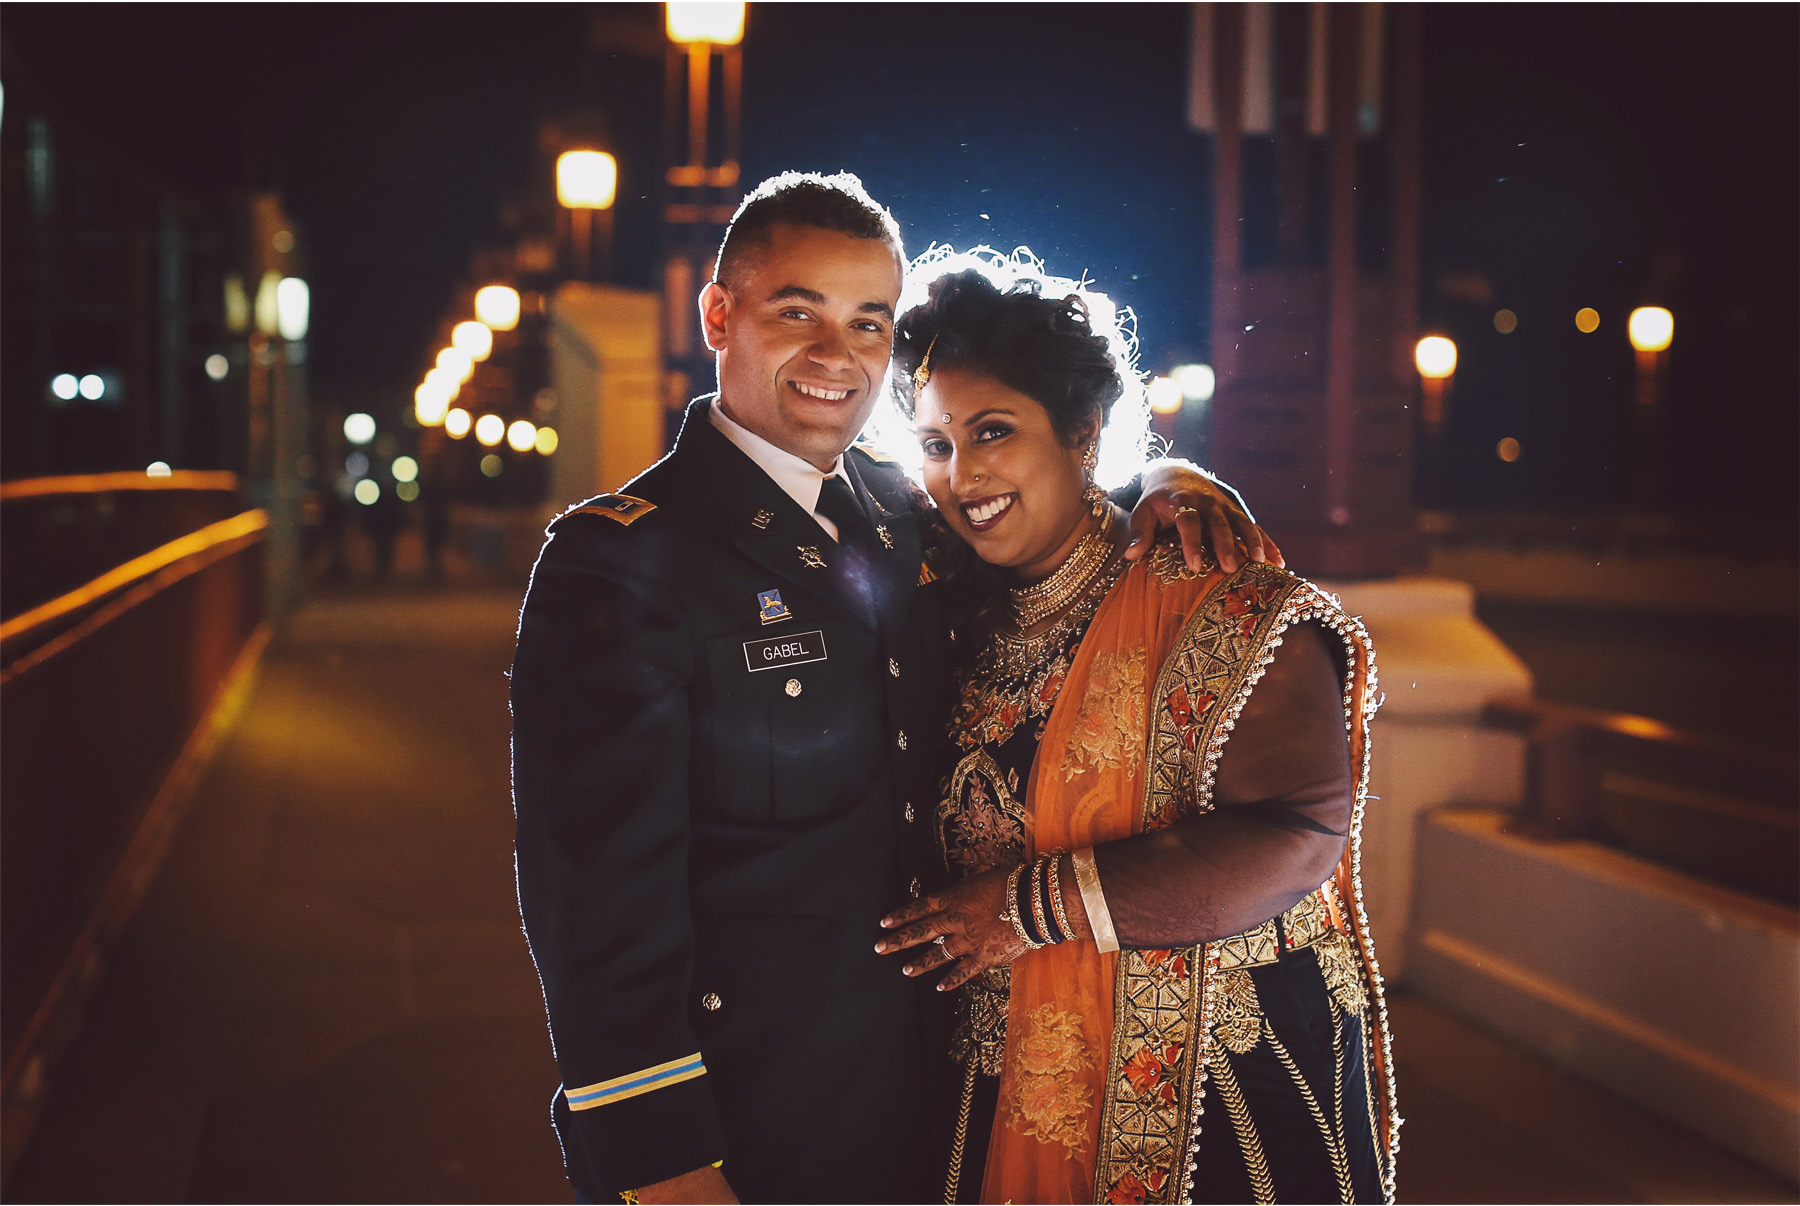 25-St-Paul-Minnesota-Wedding-Photography-by-Vick-Photography-Happy-Bride-and-Groom-Night-Photography-Leena-and-Michael.jpg